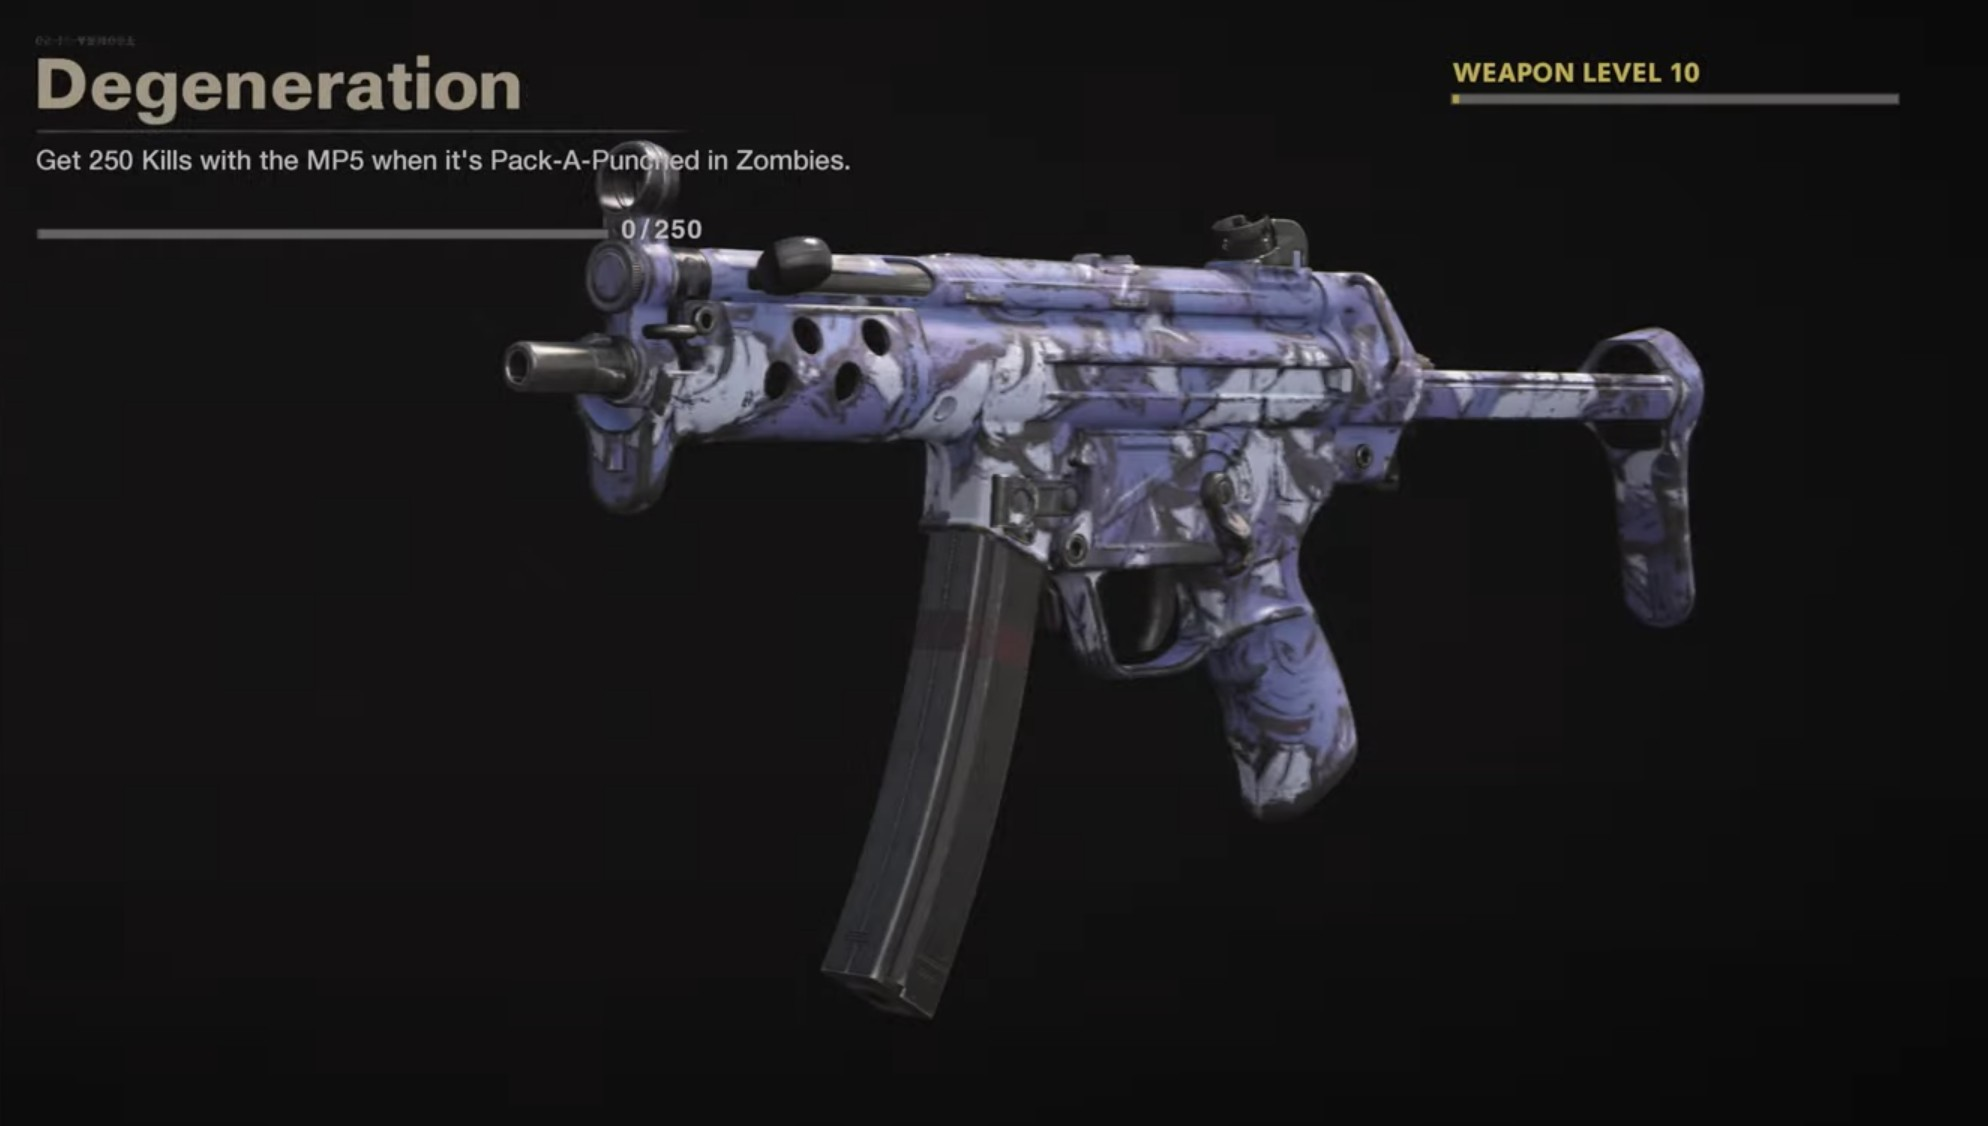 Black Ops Cold War Zombies Camo Challenges - Degeneration